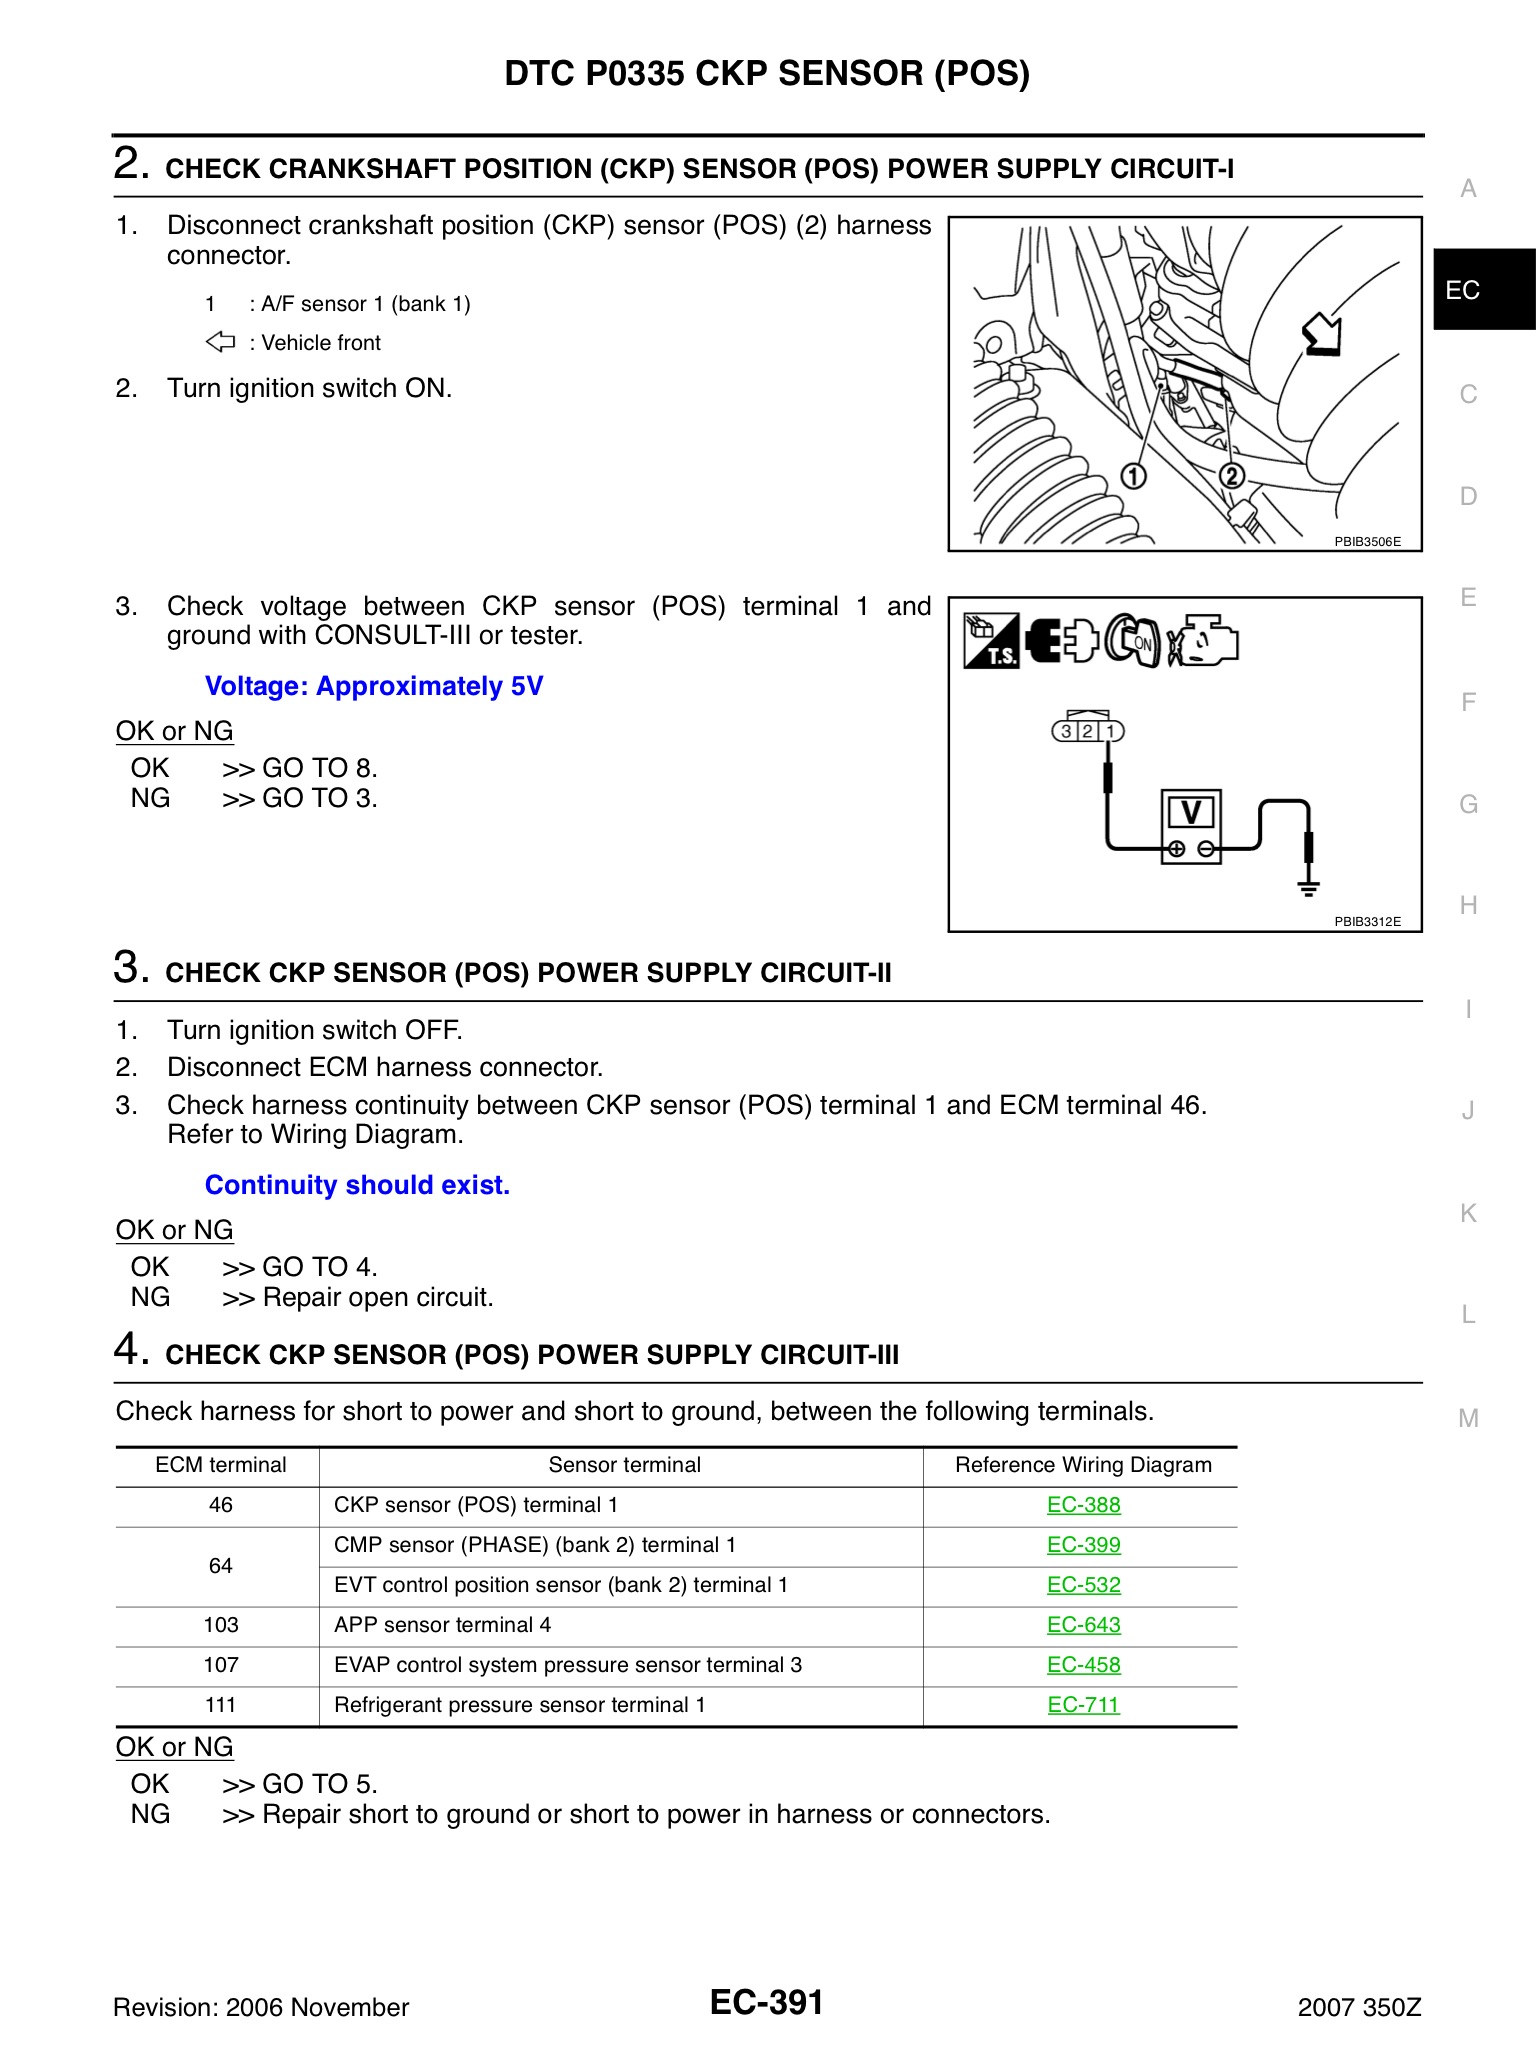 hight resolution of  350z crankshaft position sensor wiring basic guide wiring diagram u2022 97 intrepid crankshaft position sensor